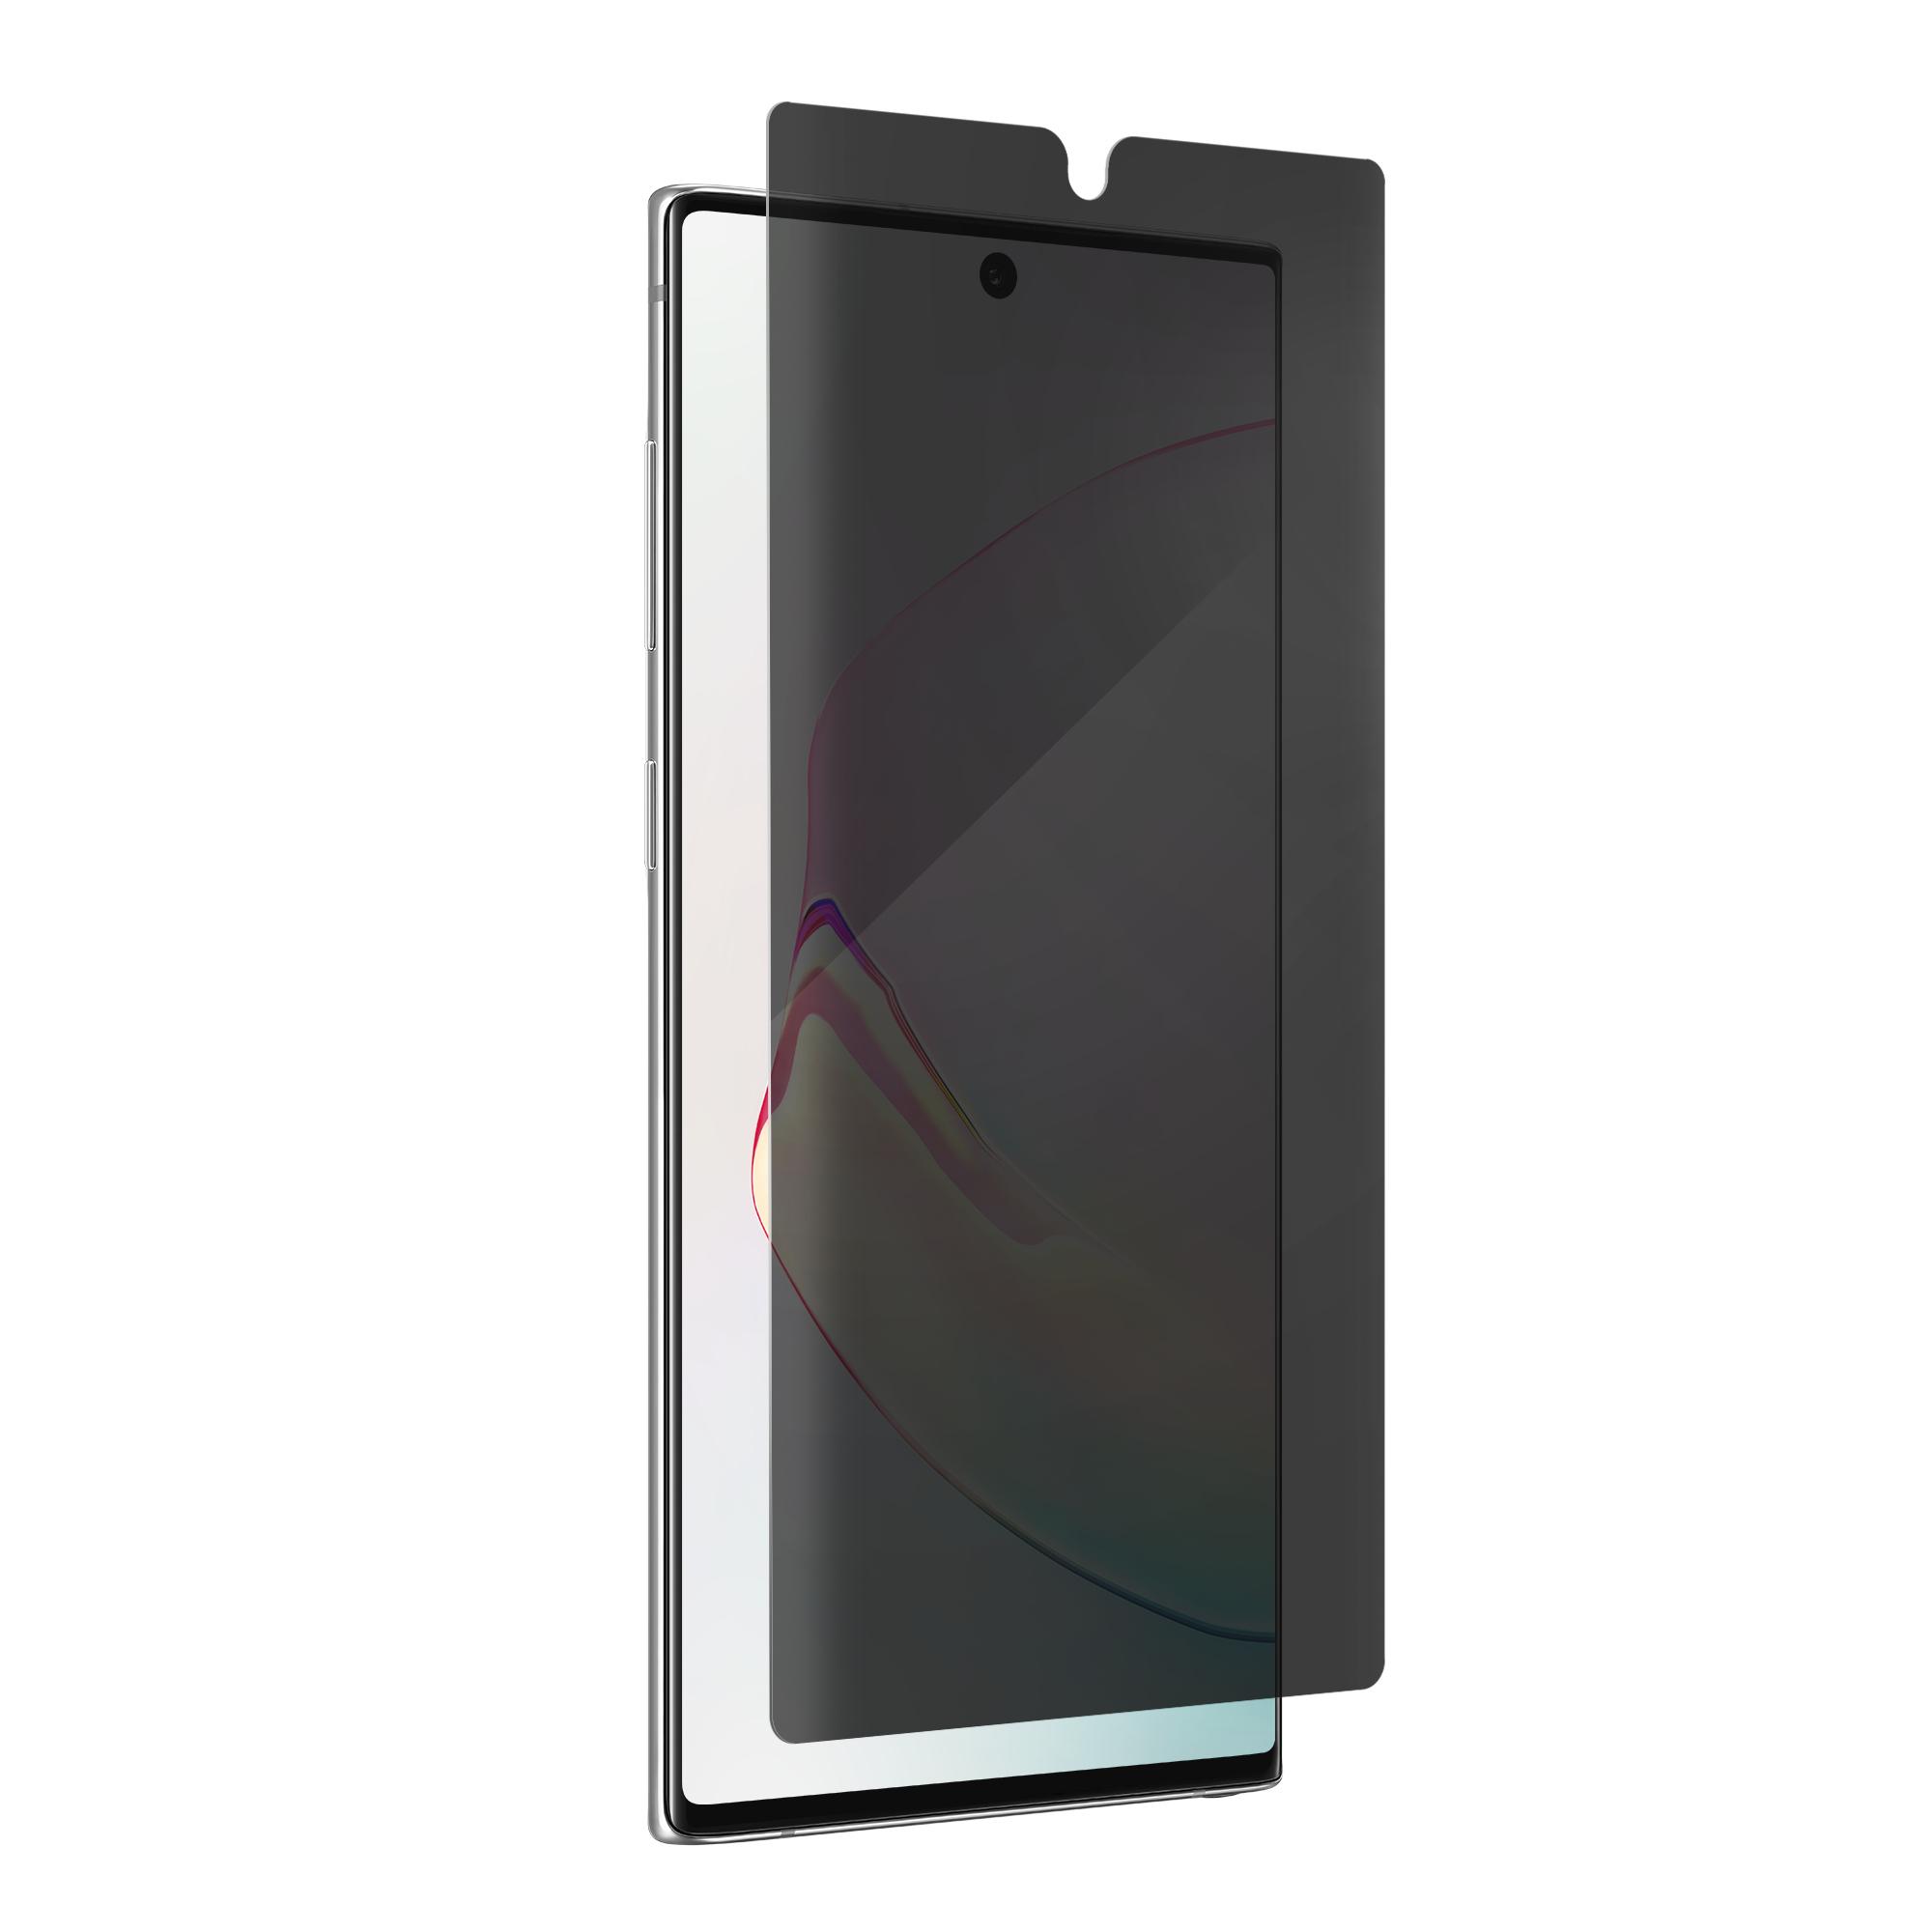 "ZAGG Ultra Privacy Randloze privacyfilter voor schermen 17,3 cm (6.8"")"